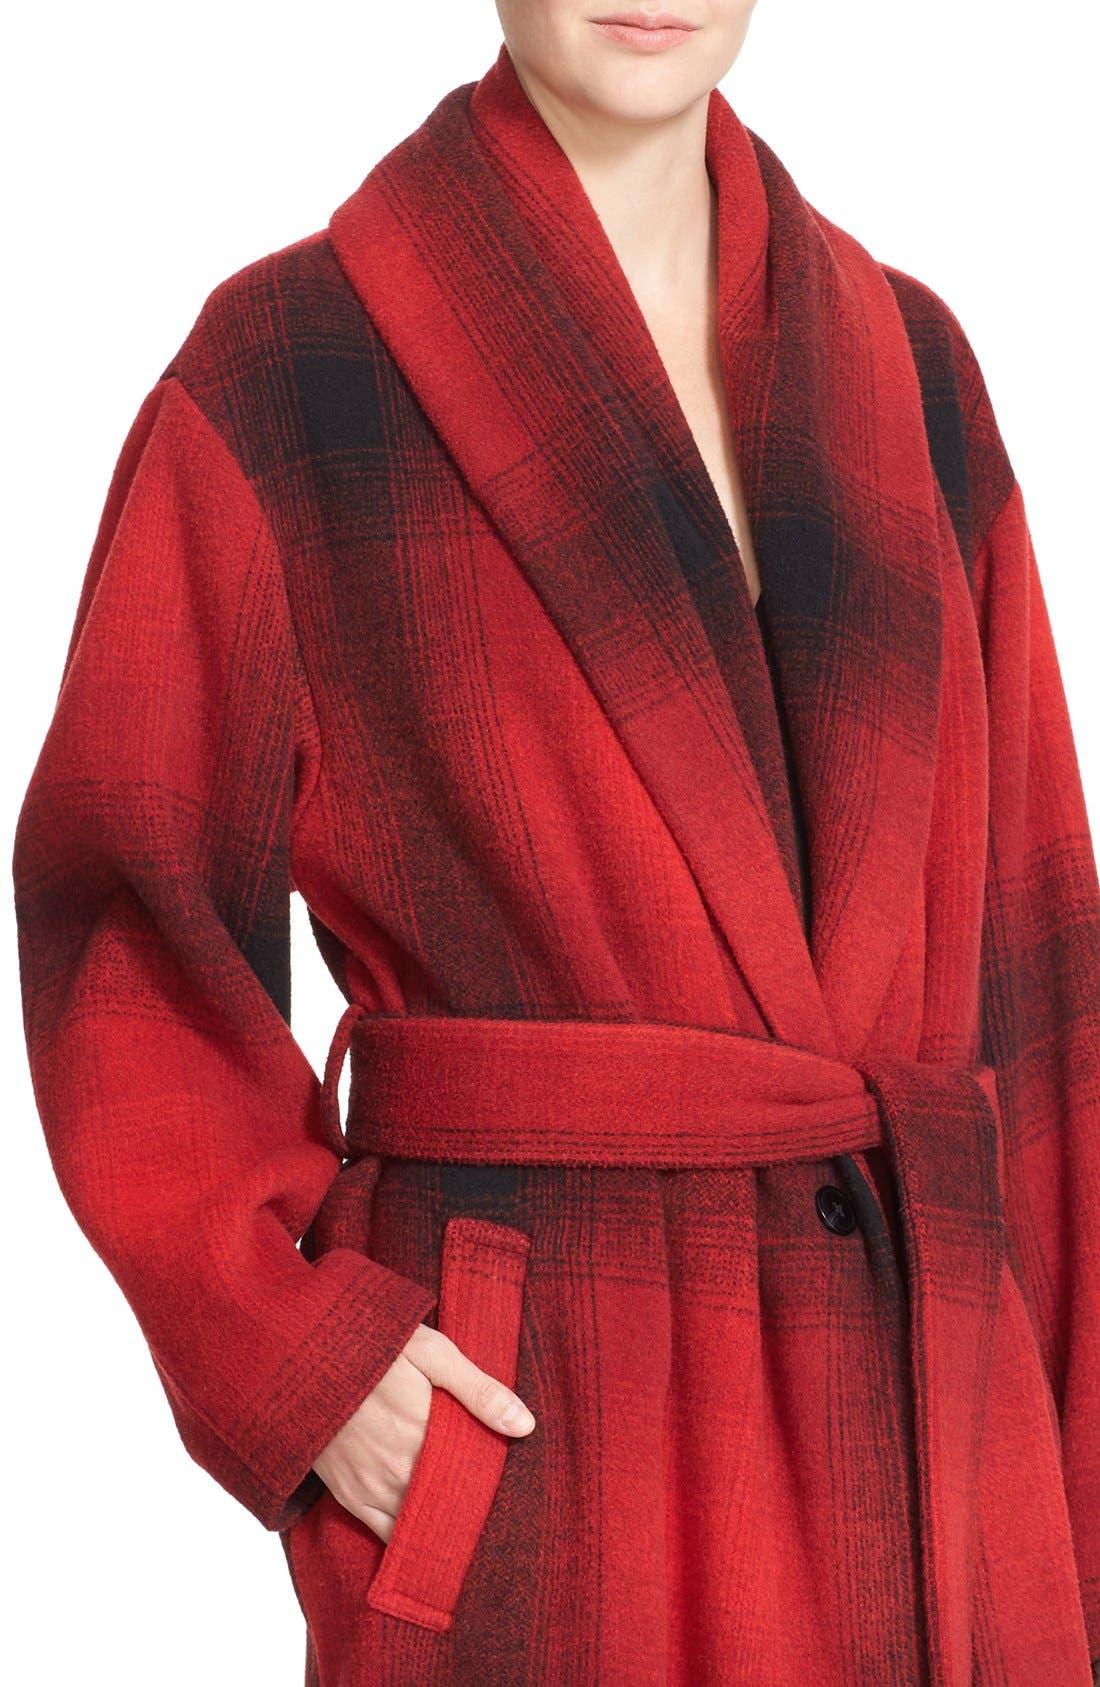 ALEXANDERWANG.T, T by Alexander Wang Fringe Oversized Shawl Collar Coat, Alternate thumbnail 4, color, 001